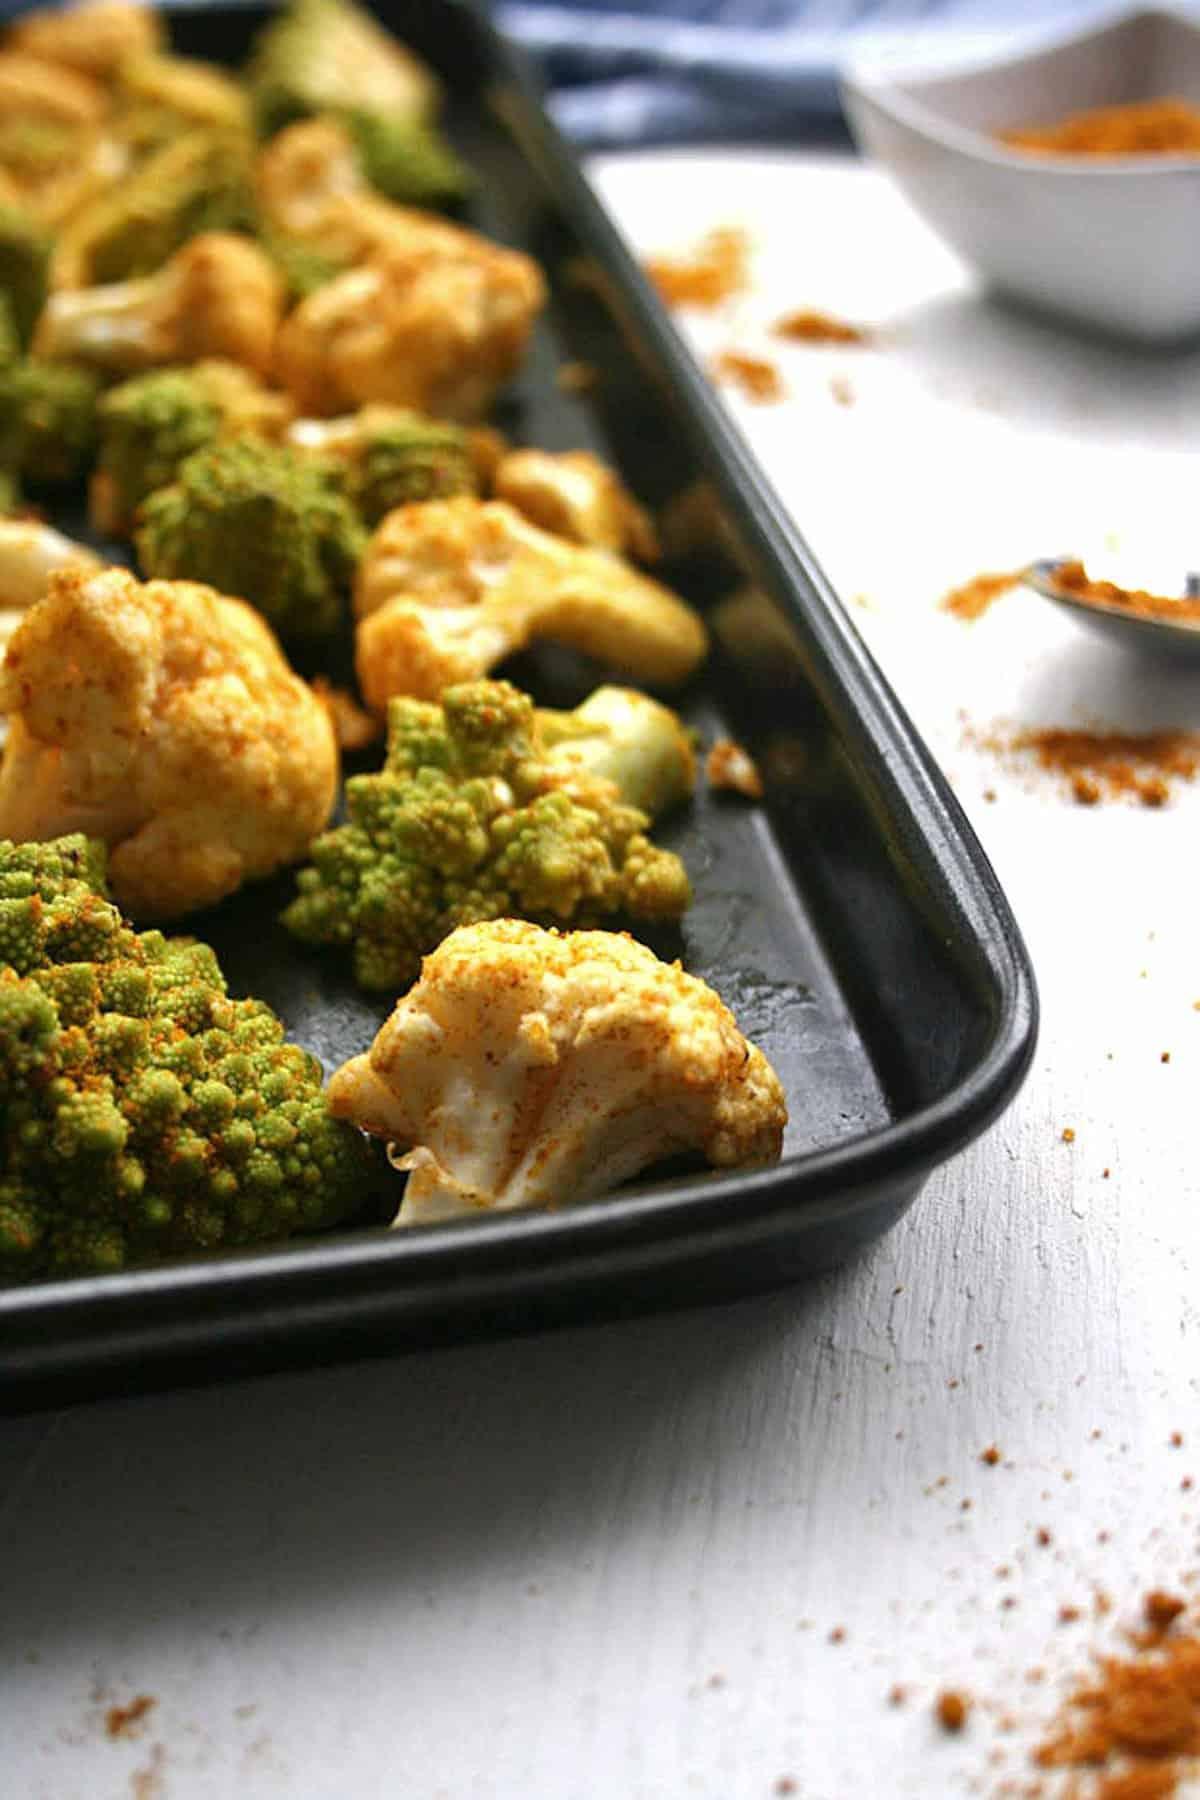 Roasted Cauliflower Farro Salad - A healthy vegan autumnal salad recipe made with delicious spiced roasted cauliflower and chewy farro | eatloveeats.com